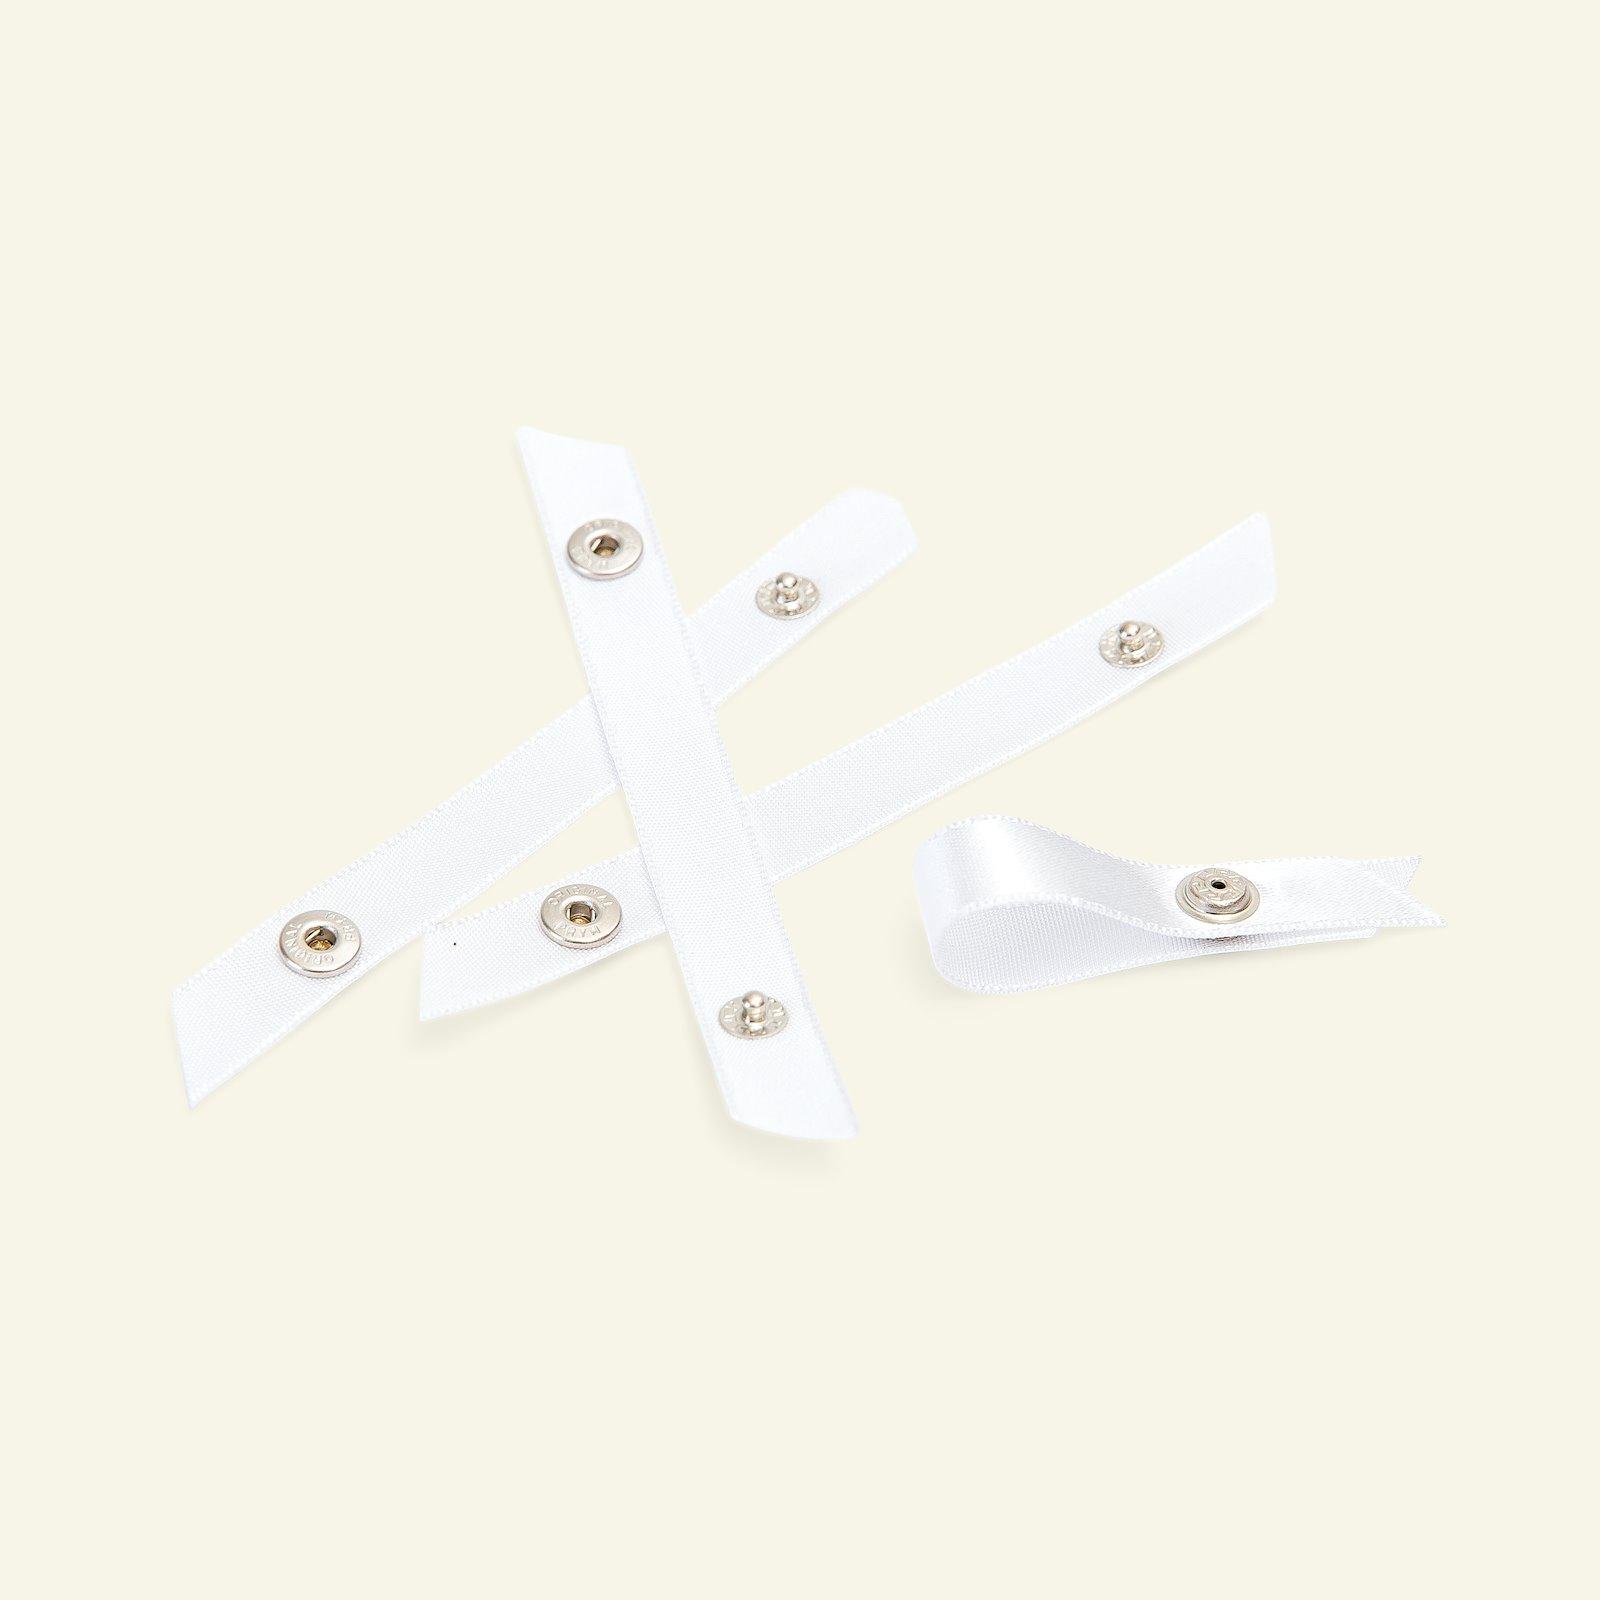 Prym Shoulder Strap Retainers white 4pcs 44905_pack